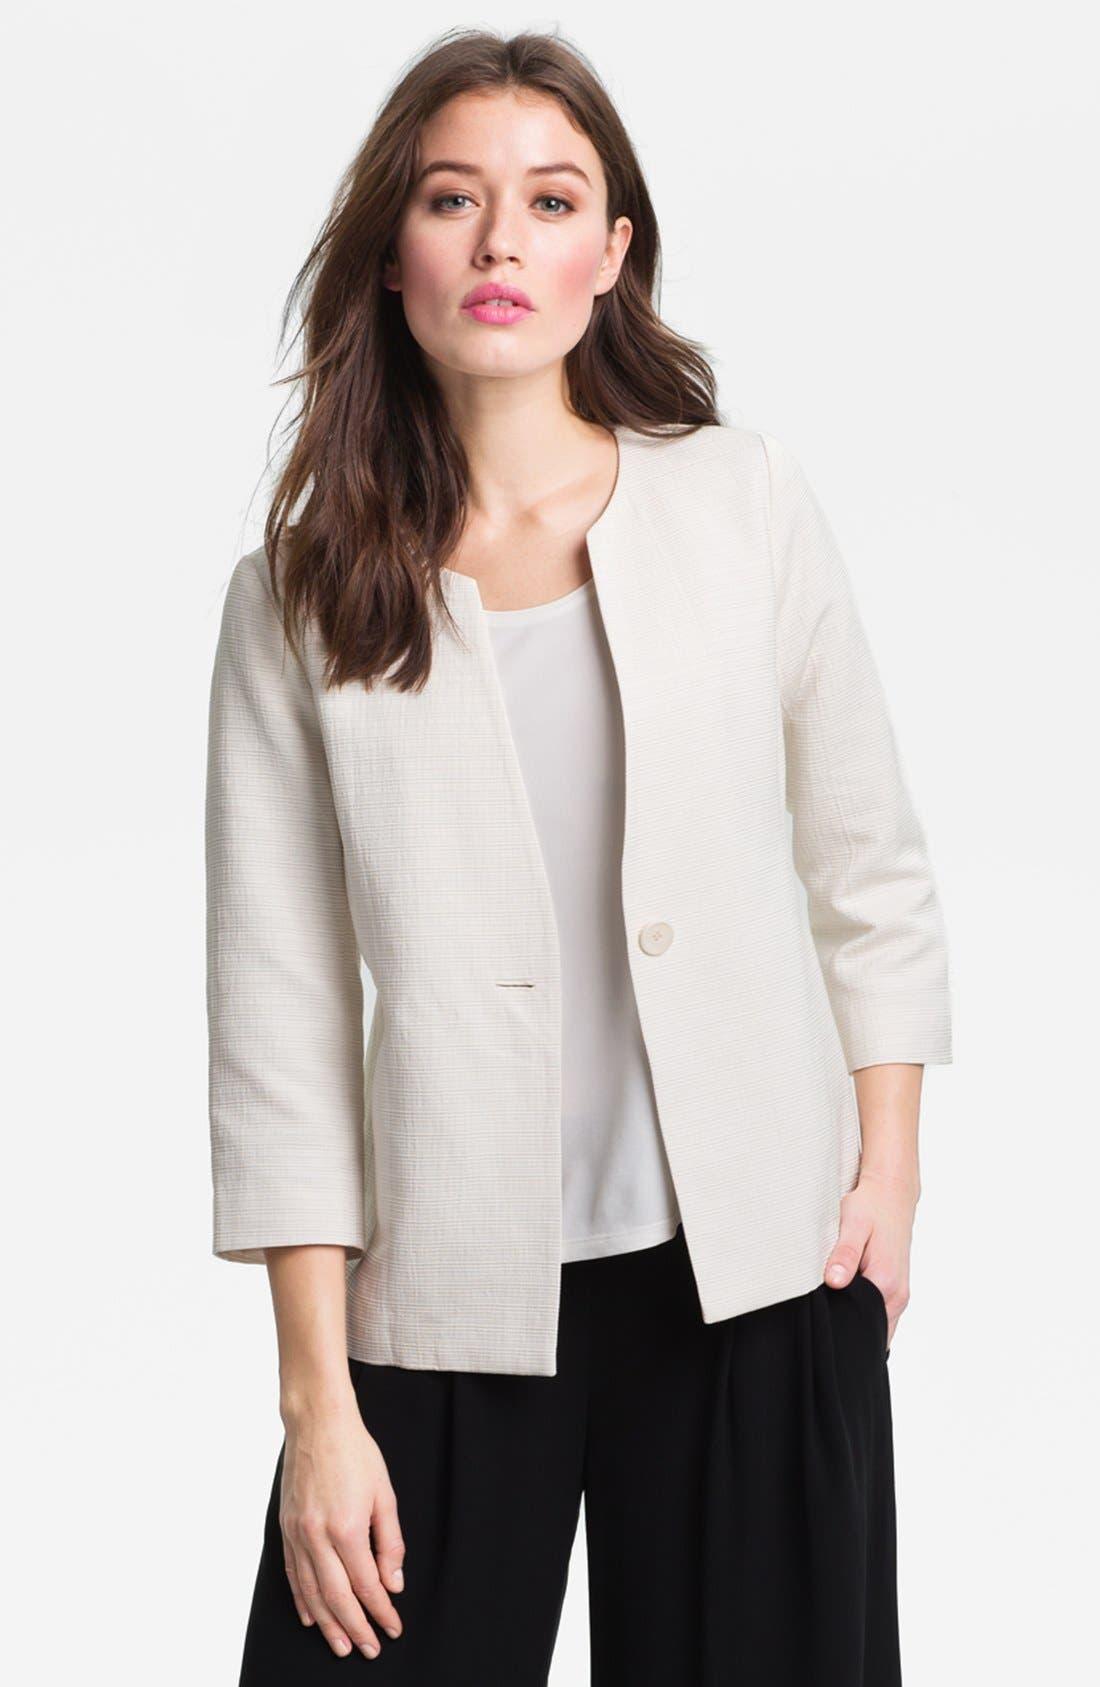 Alternate Image 1 Selected - Eileen Fisher Three Quarter Sleeve Jacket (Petite)